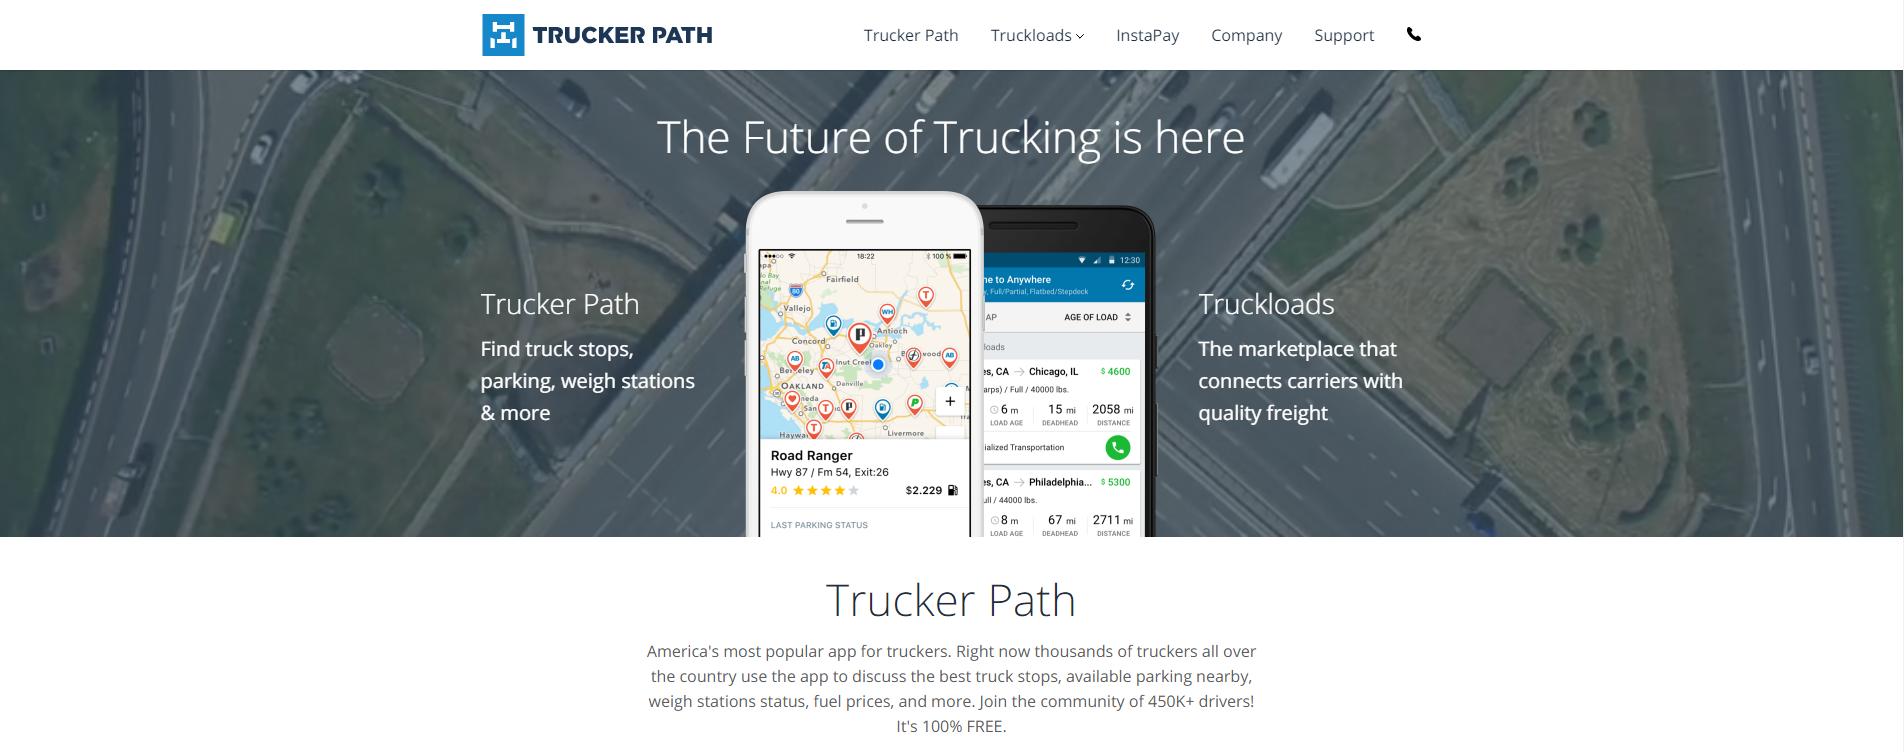 Truckerpath